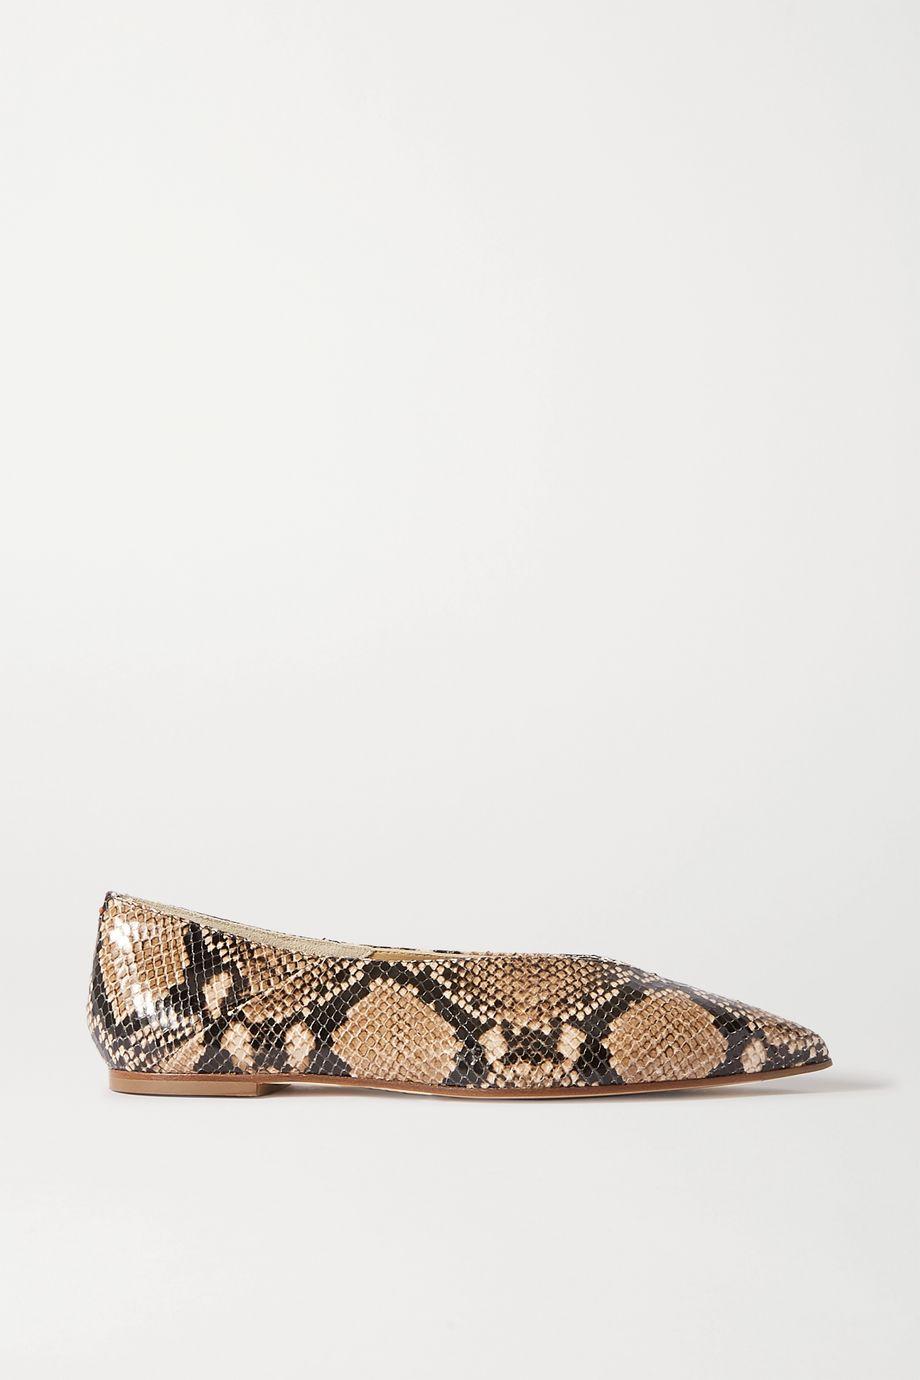 aeydē Moa snake-effect leather point-toe flats